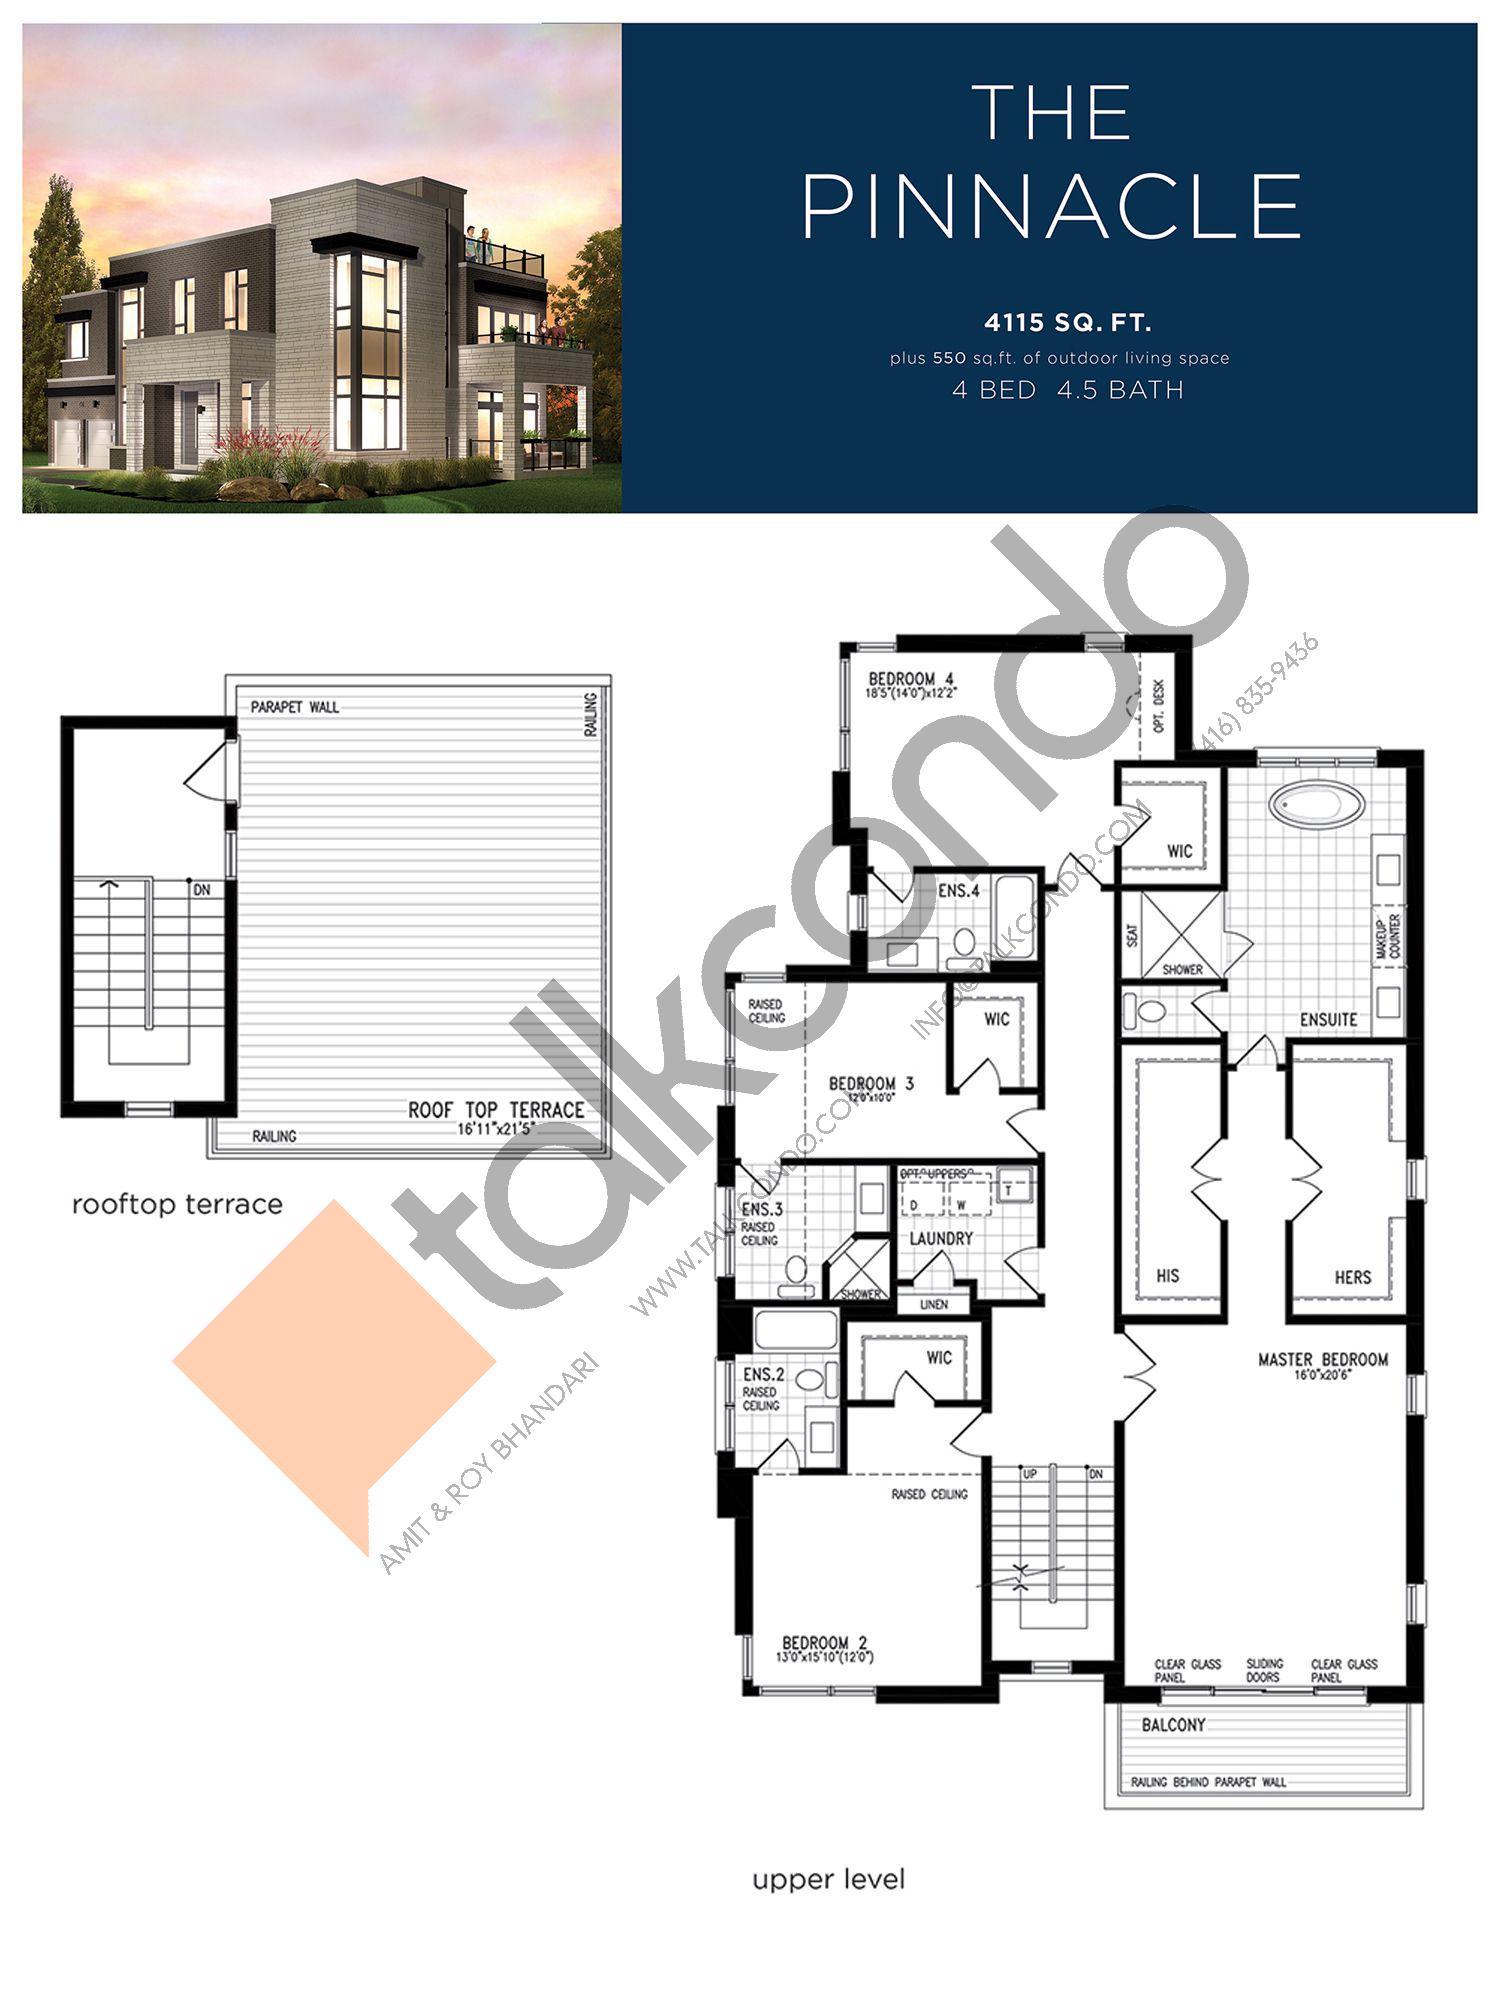 The Pinnacle (3/3) Floor Plan at Lake Breeze - 4115 sq.ft